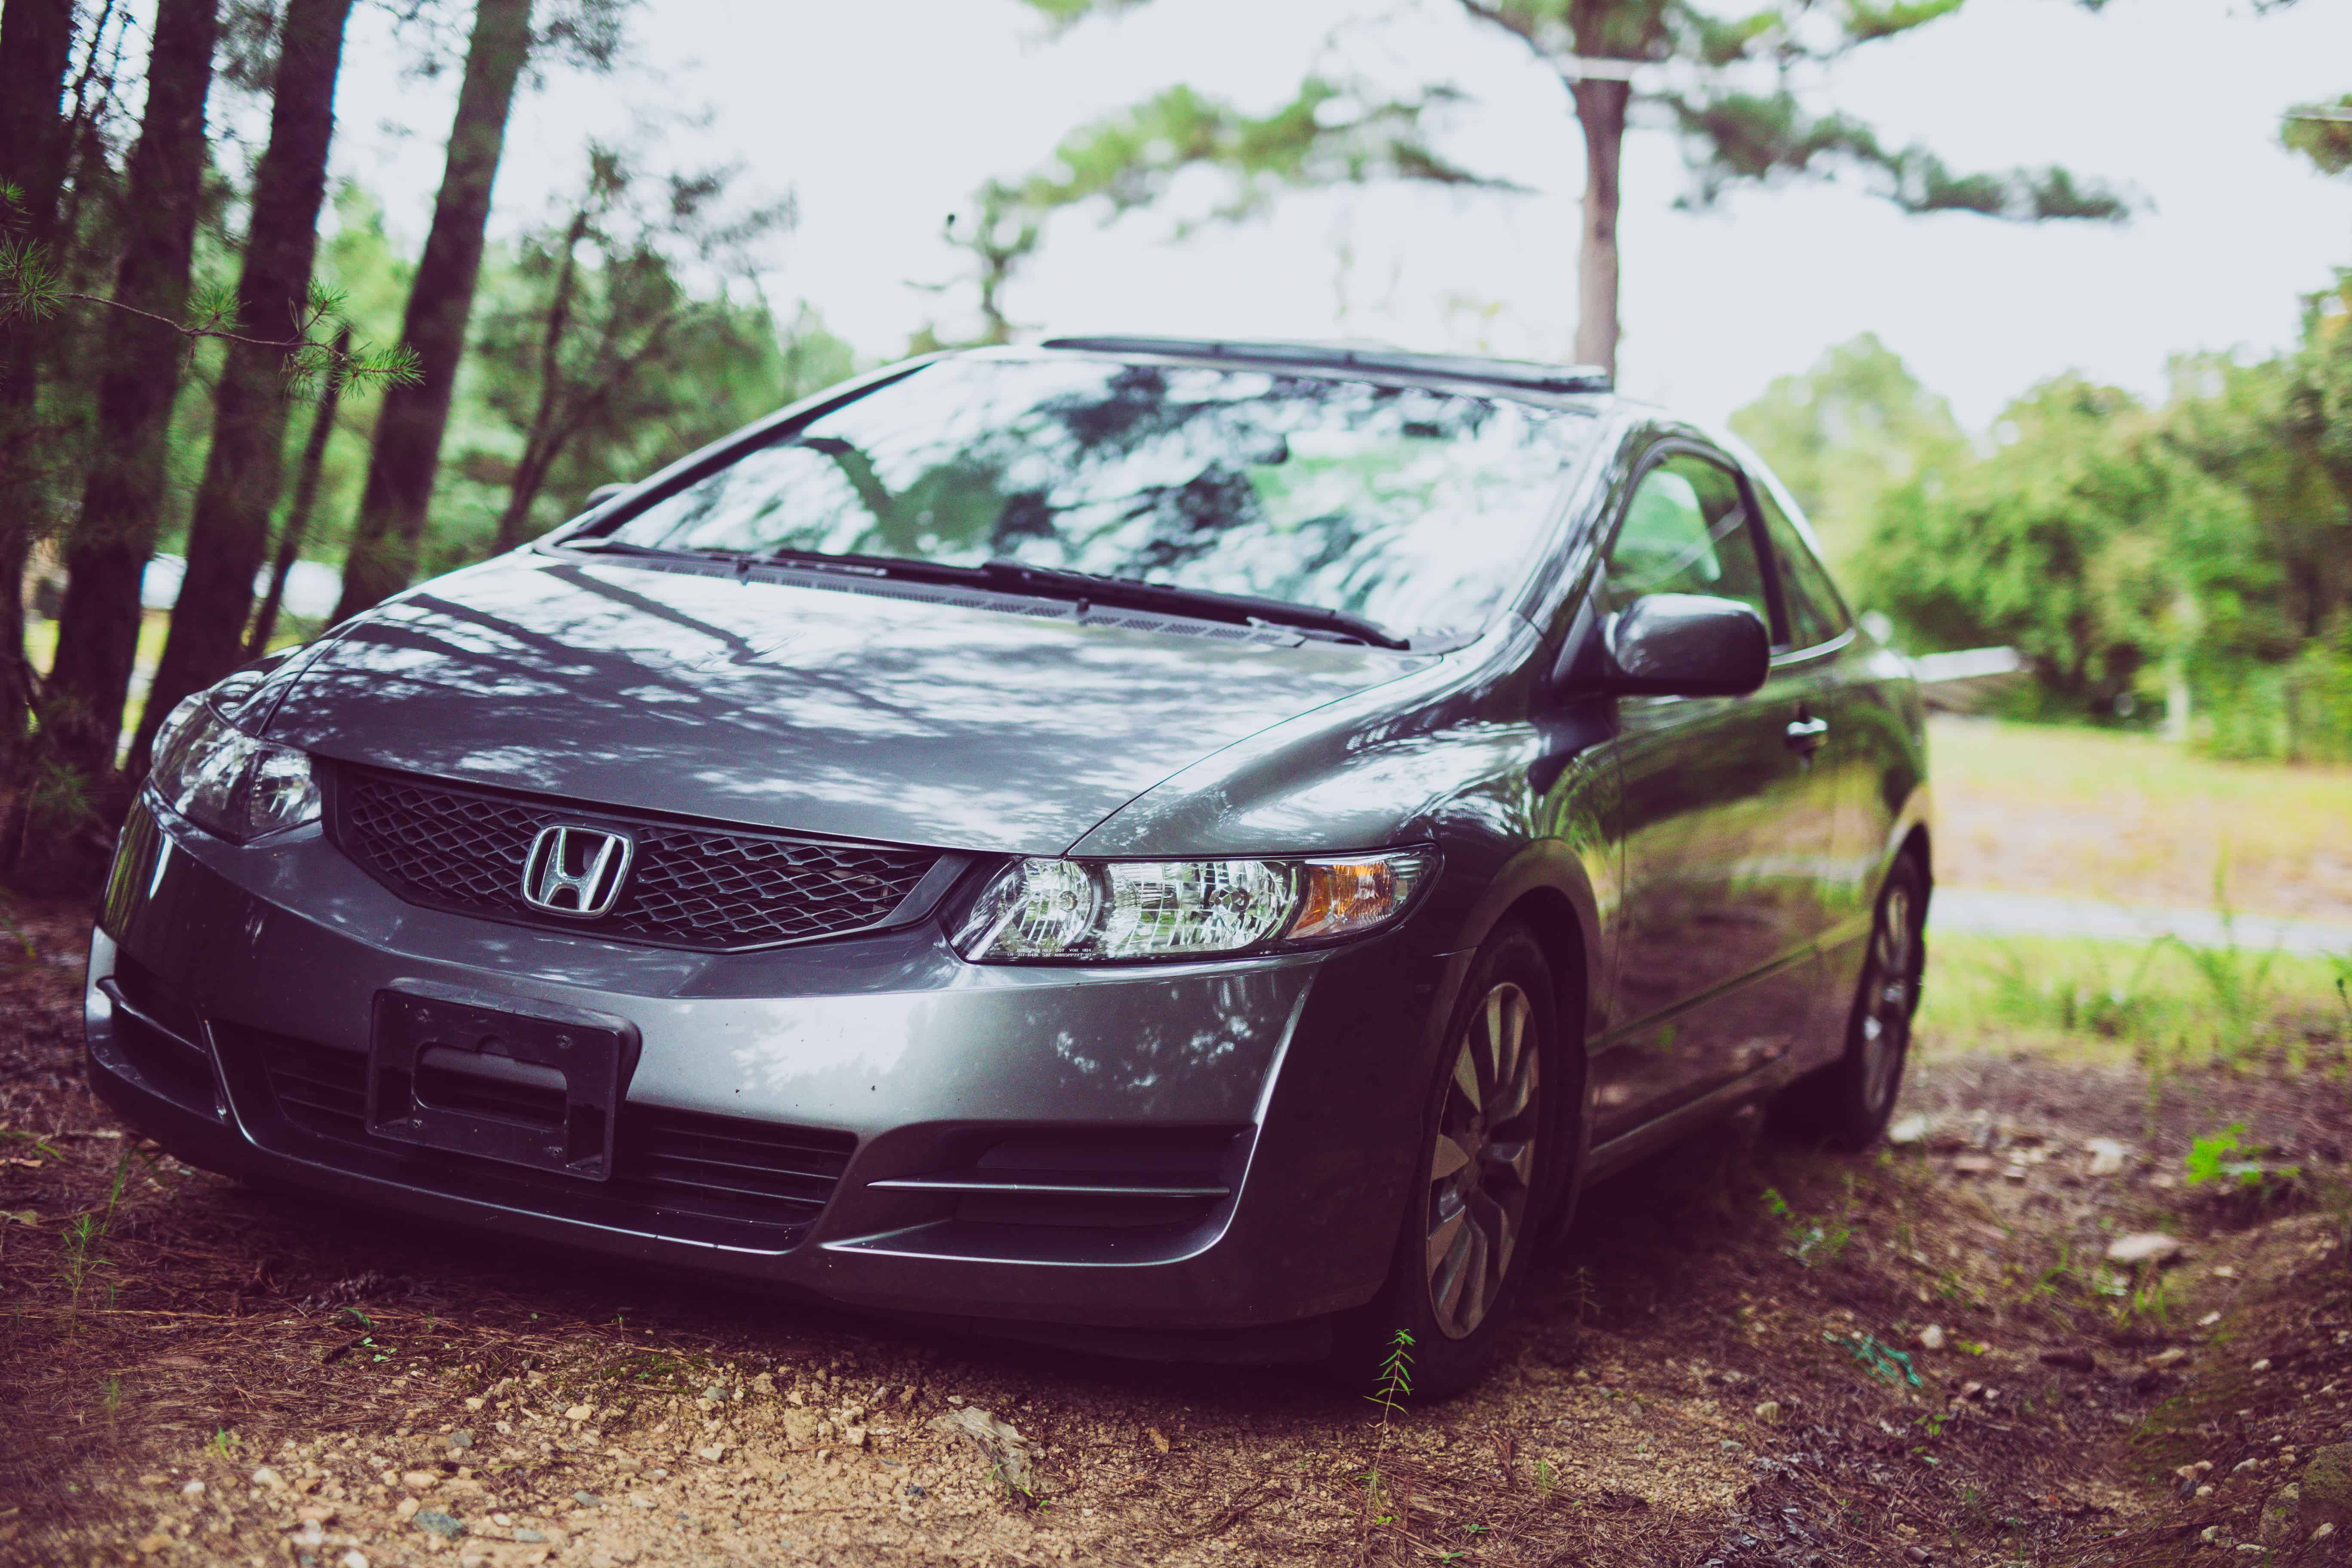 Honda Recalls Over 1,350,000 Vehicles Due to Air Bag Defect